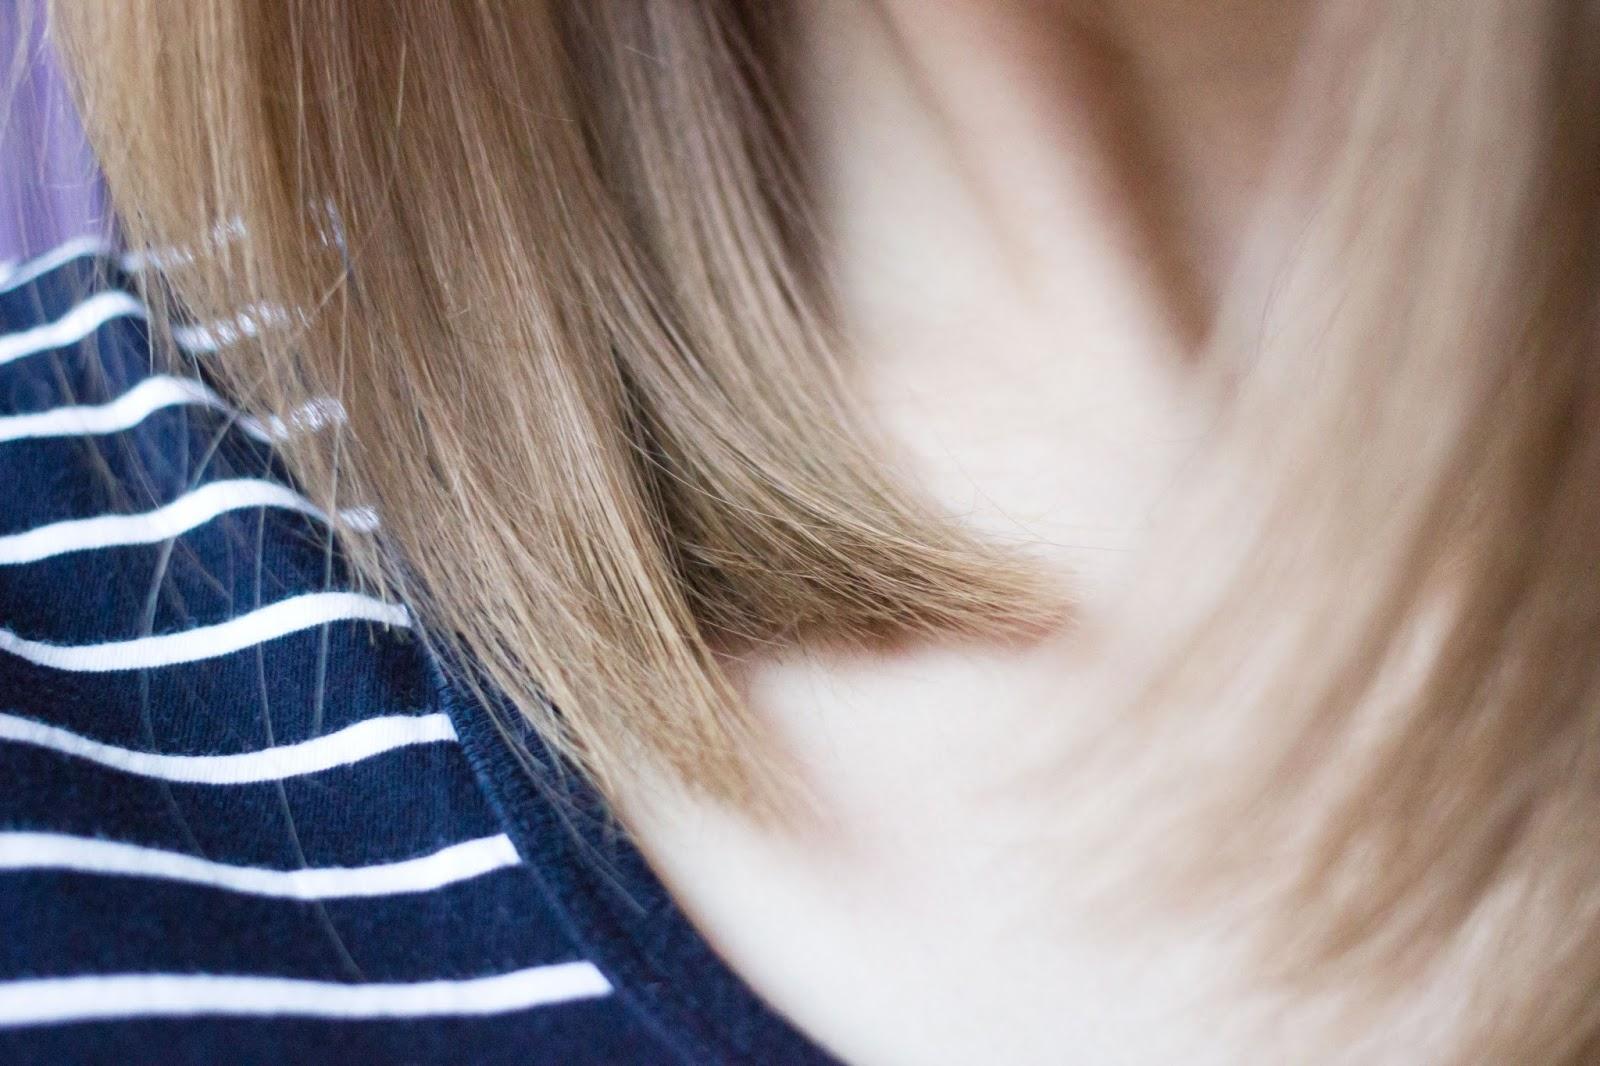 Hair, Hairstyles, Katie Writes Blog, Katie Writes,